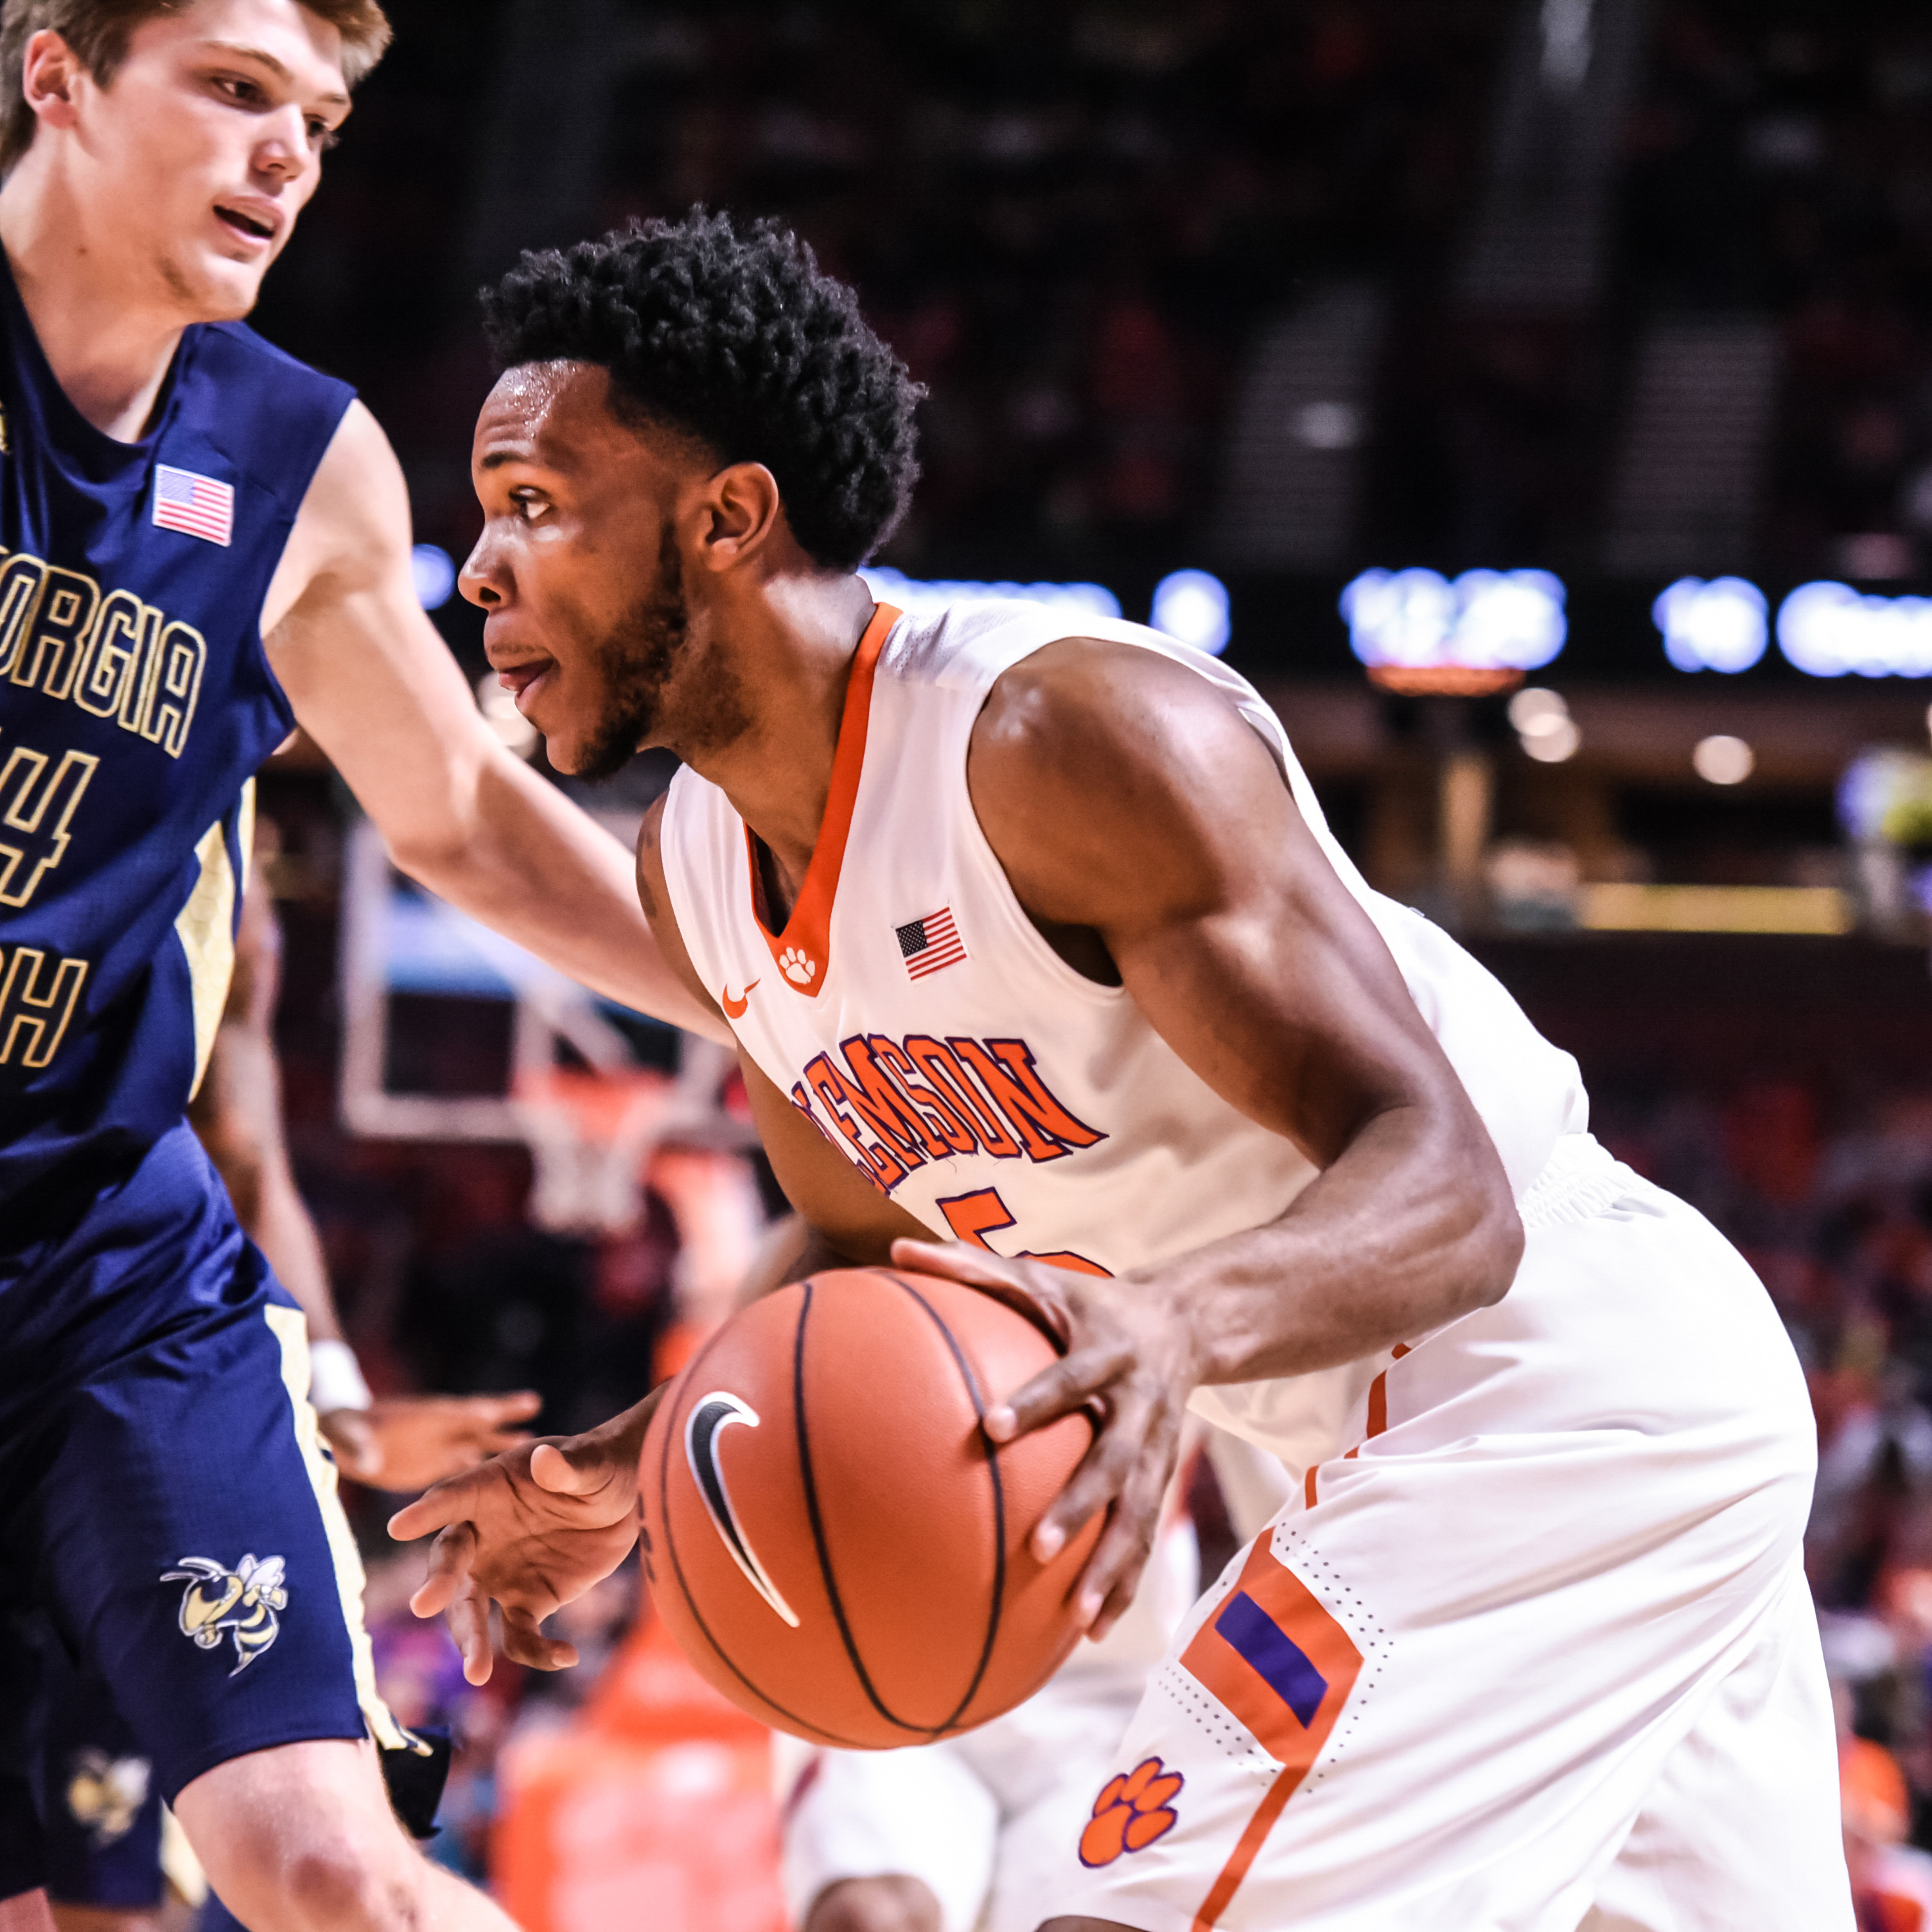 Clemson Faces Georgia Tech in ACC Tourney